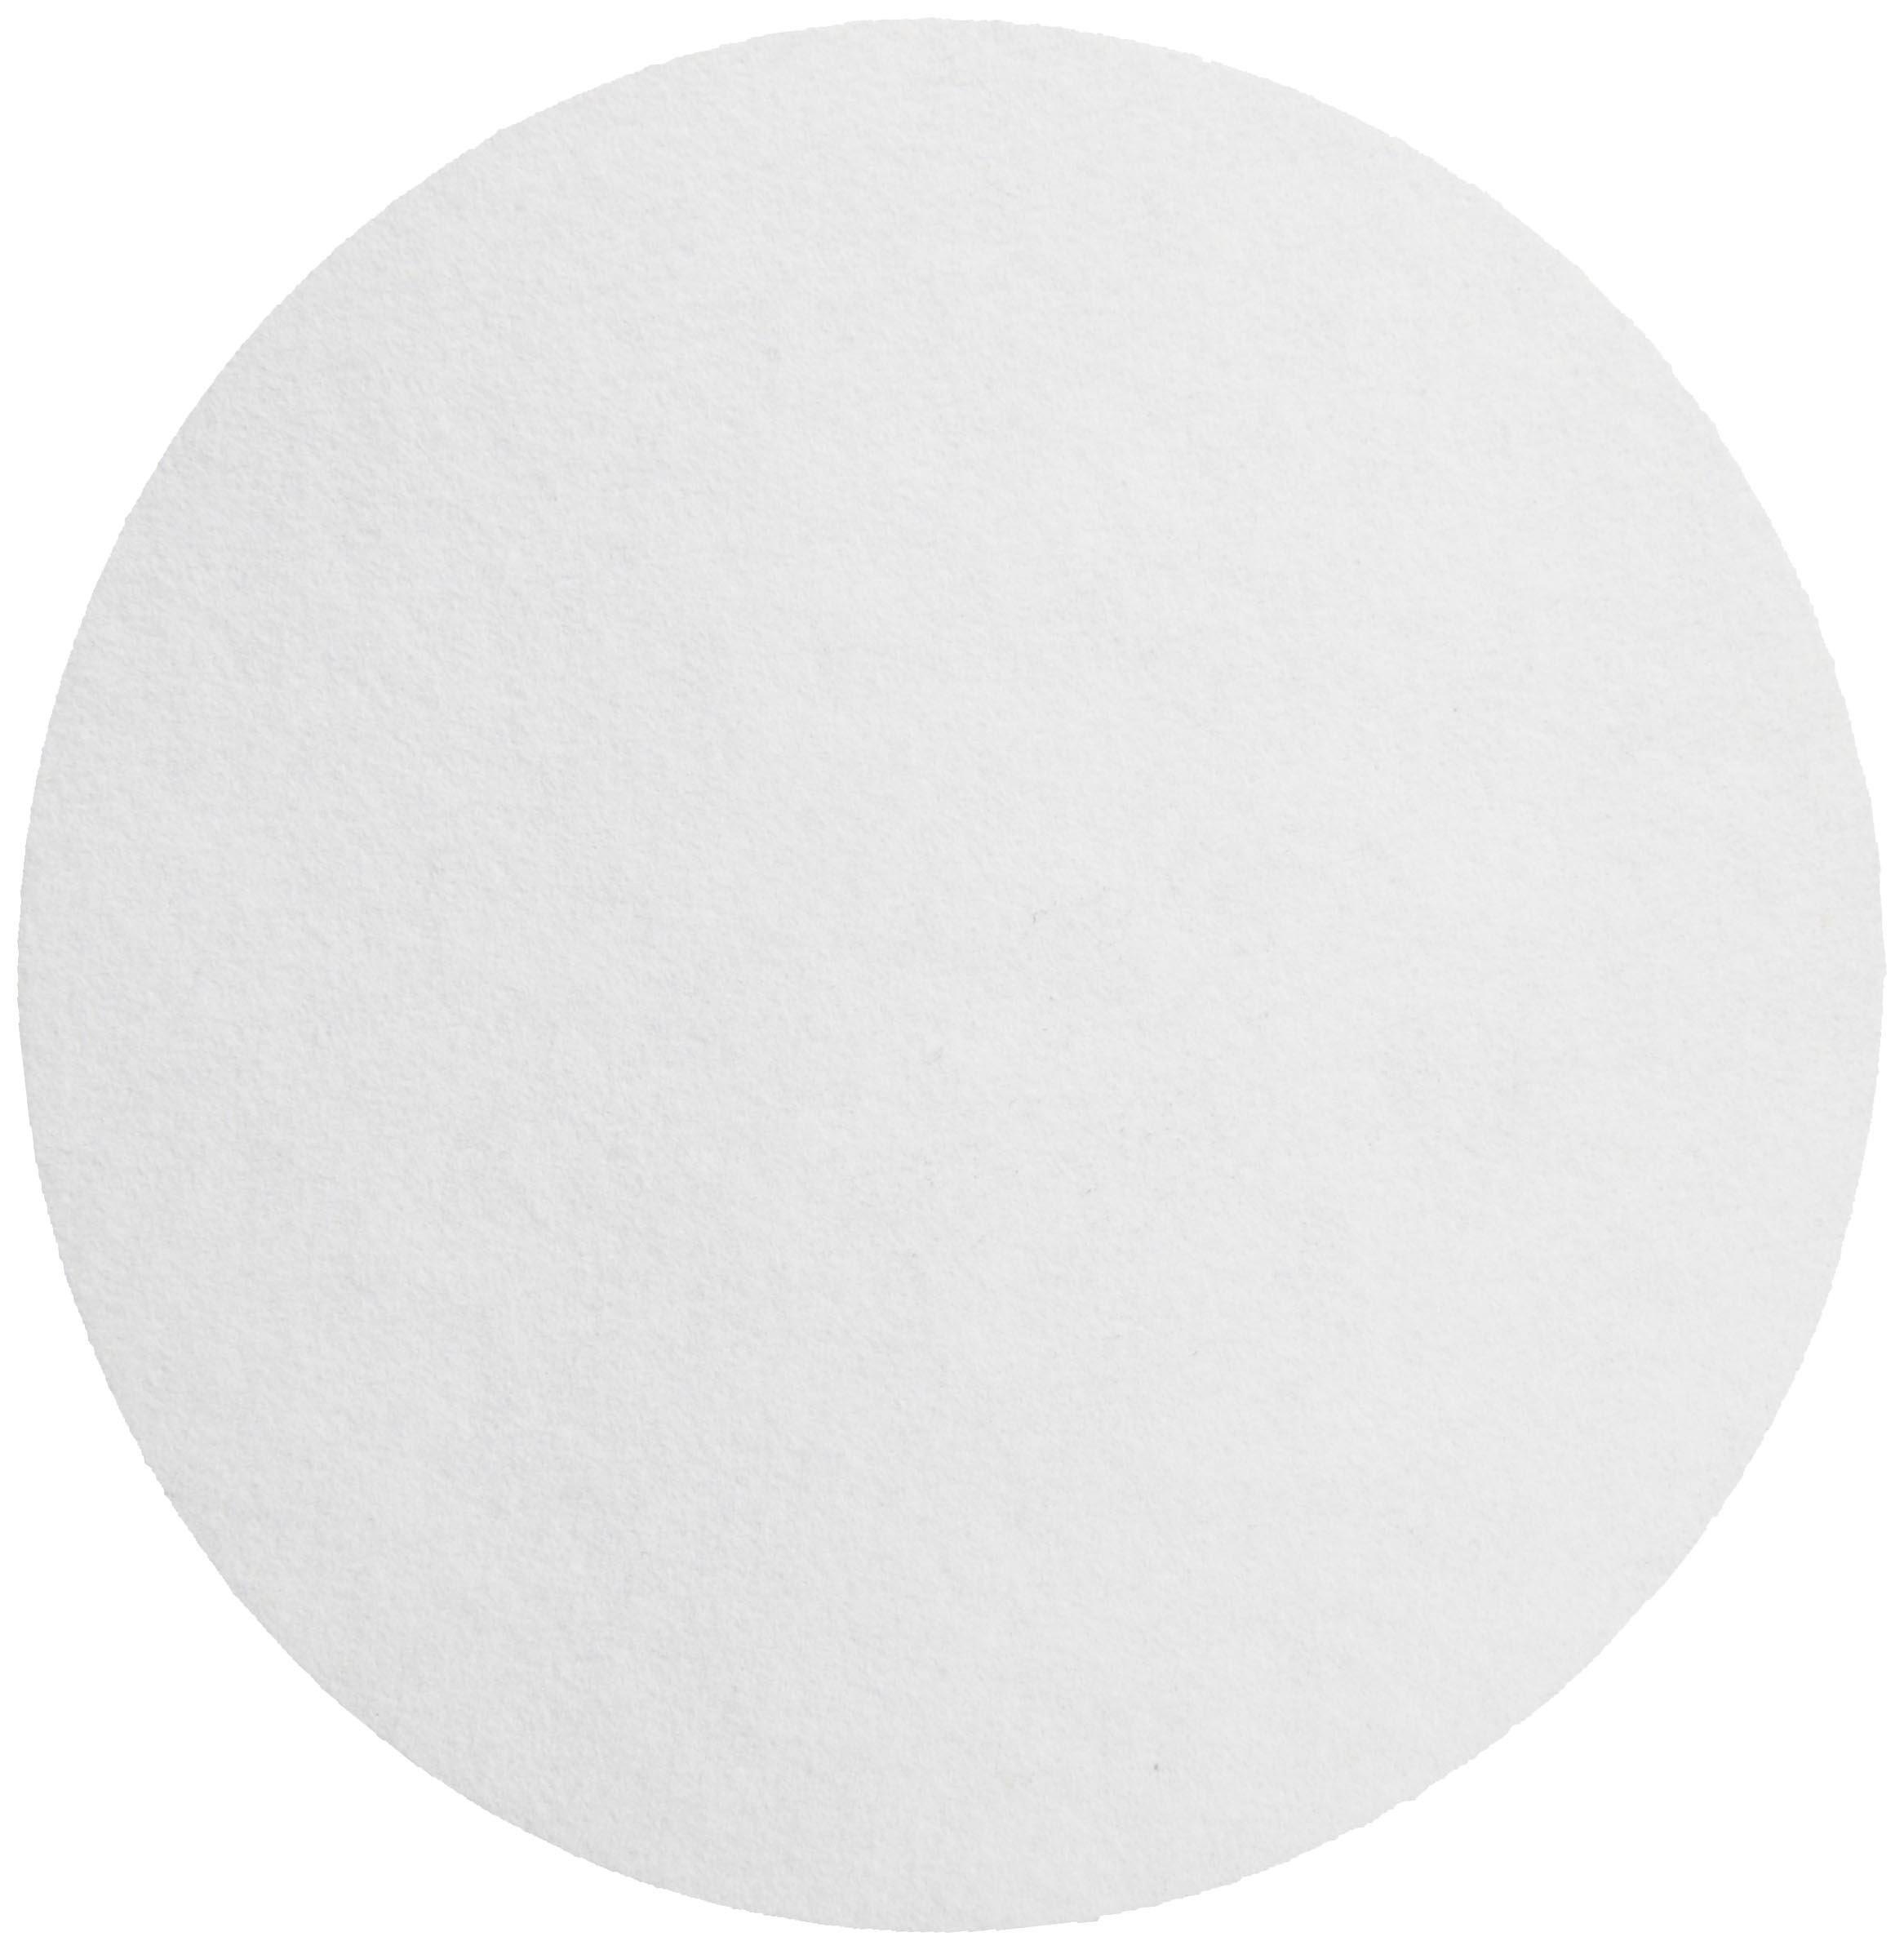 Whatman 1003-070 Quantitative Filter Paper Circles, 6 Micron, 26 s/100mL/sq inch Flow Rate, Grade 3, 70mm Diameter (Pack of 100) by Whatman